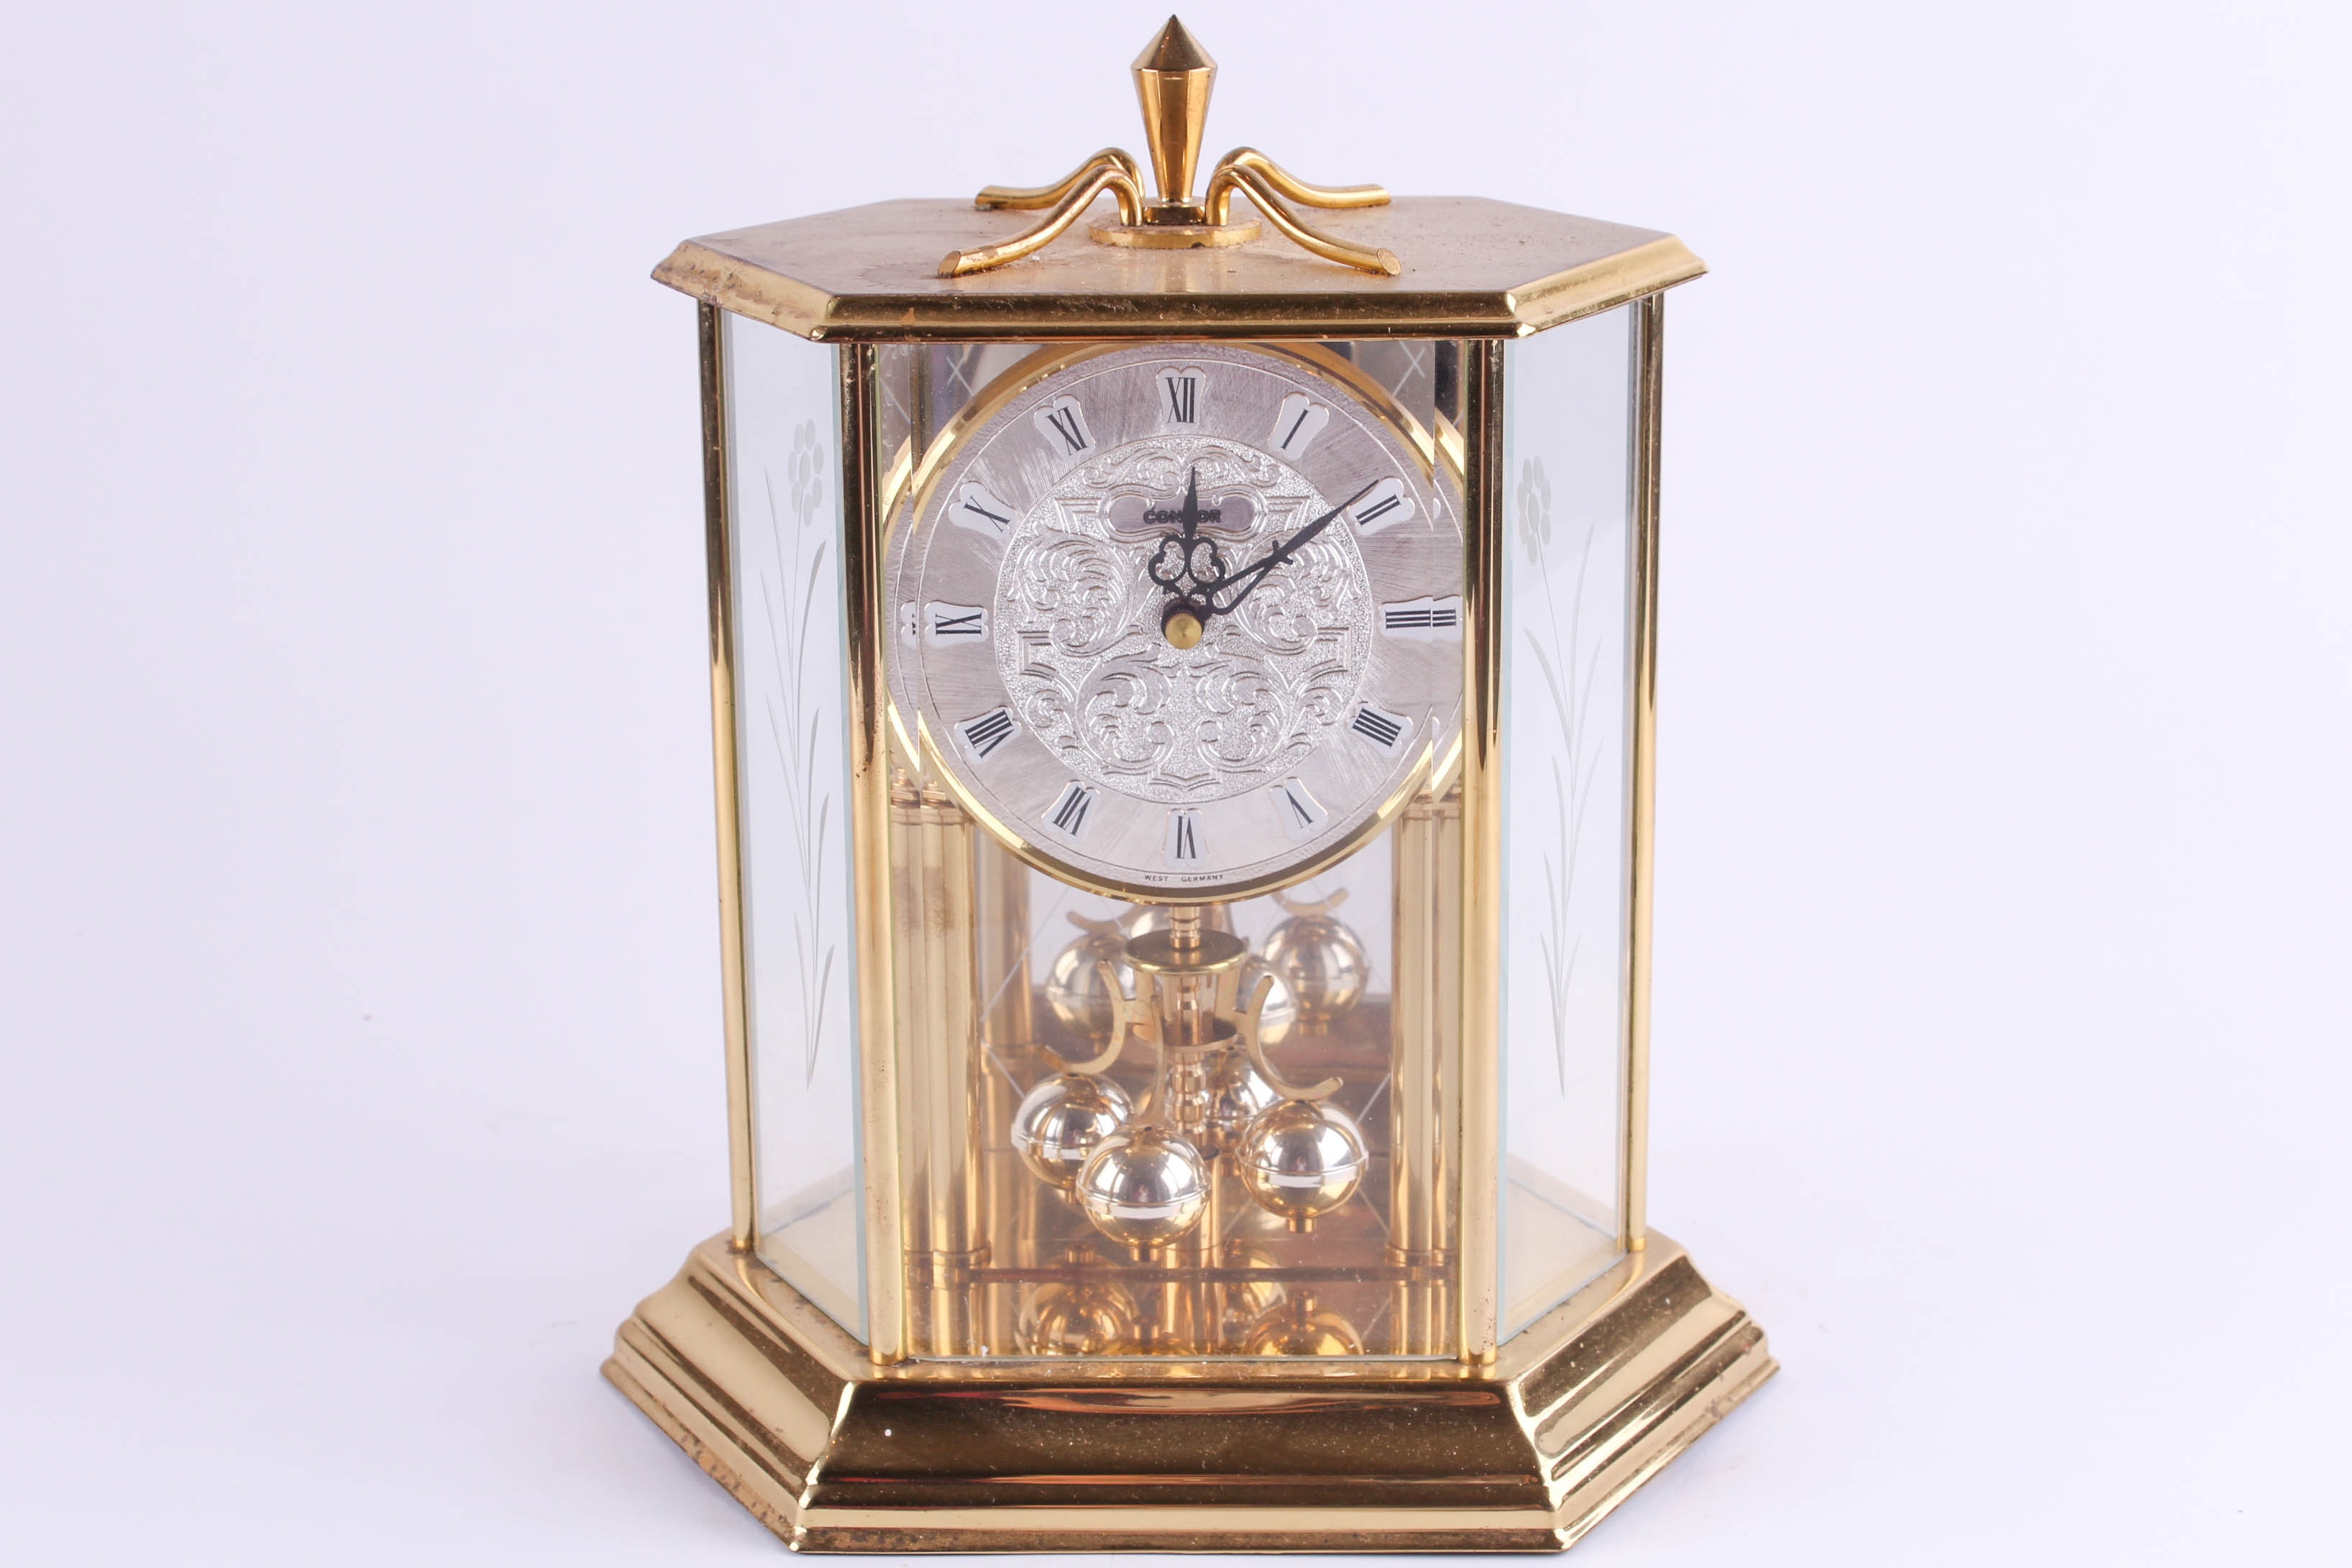 condor of germany anniversary clock